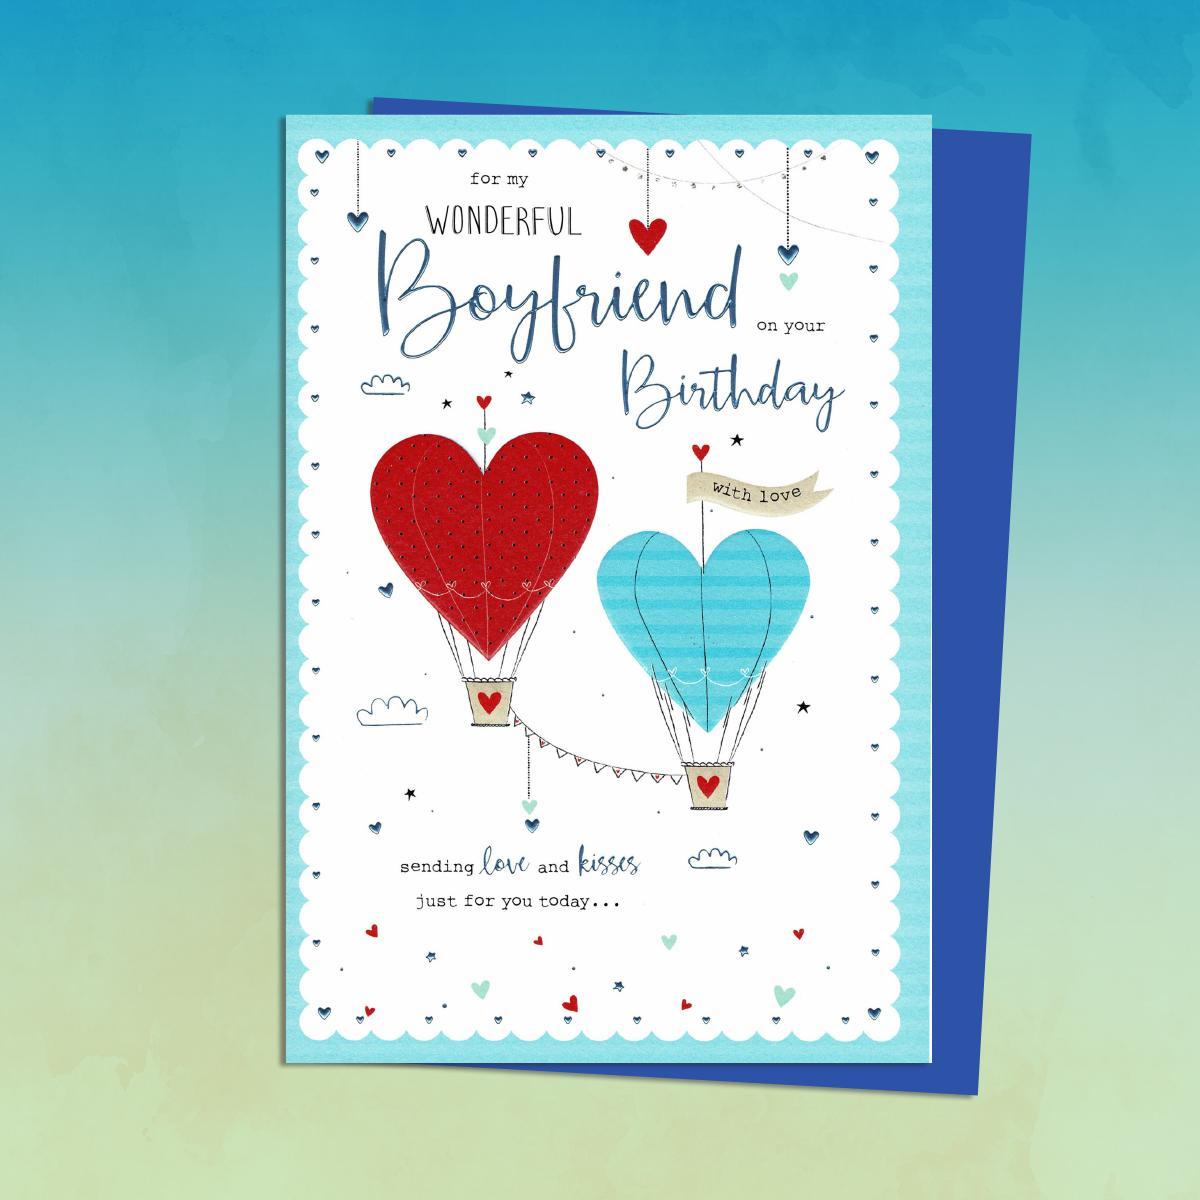 Wonderful Boyfriend Hot Air Balloons